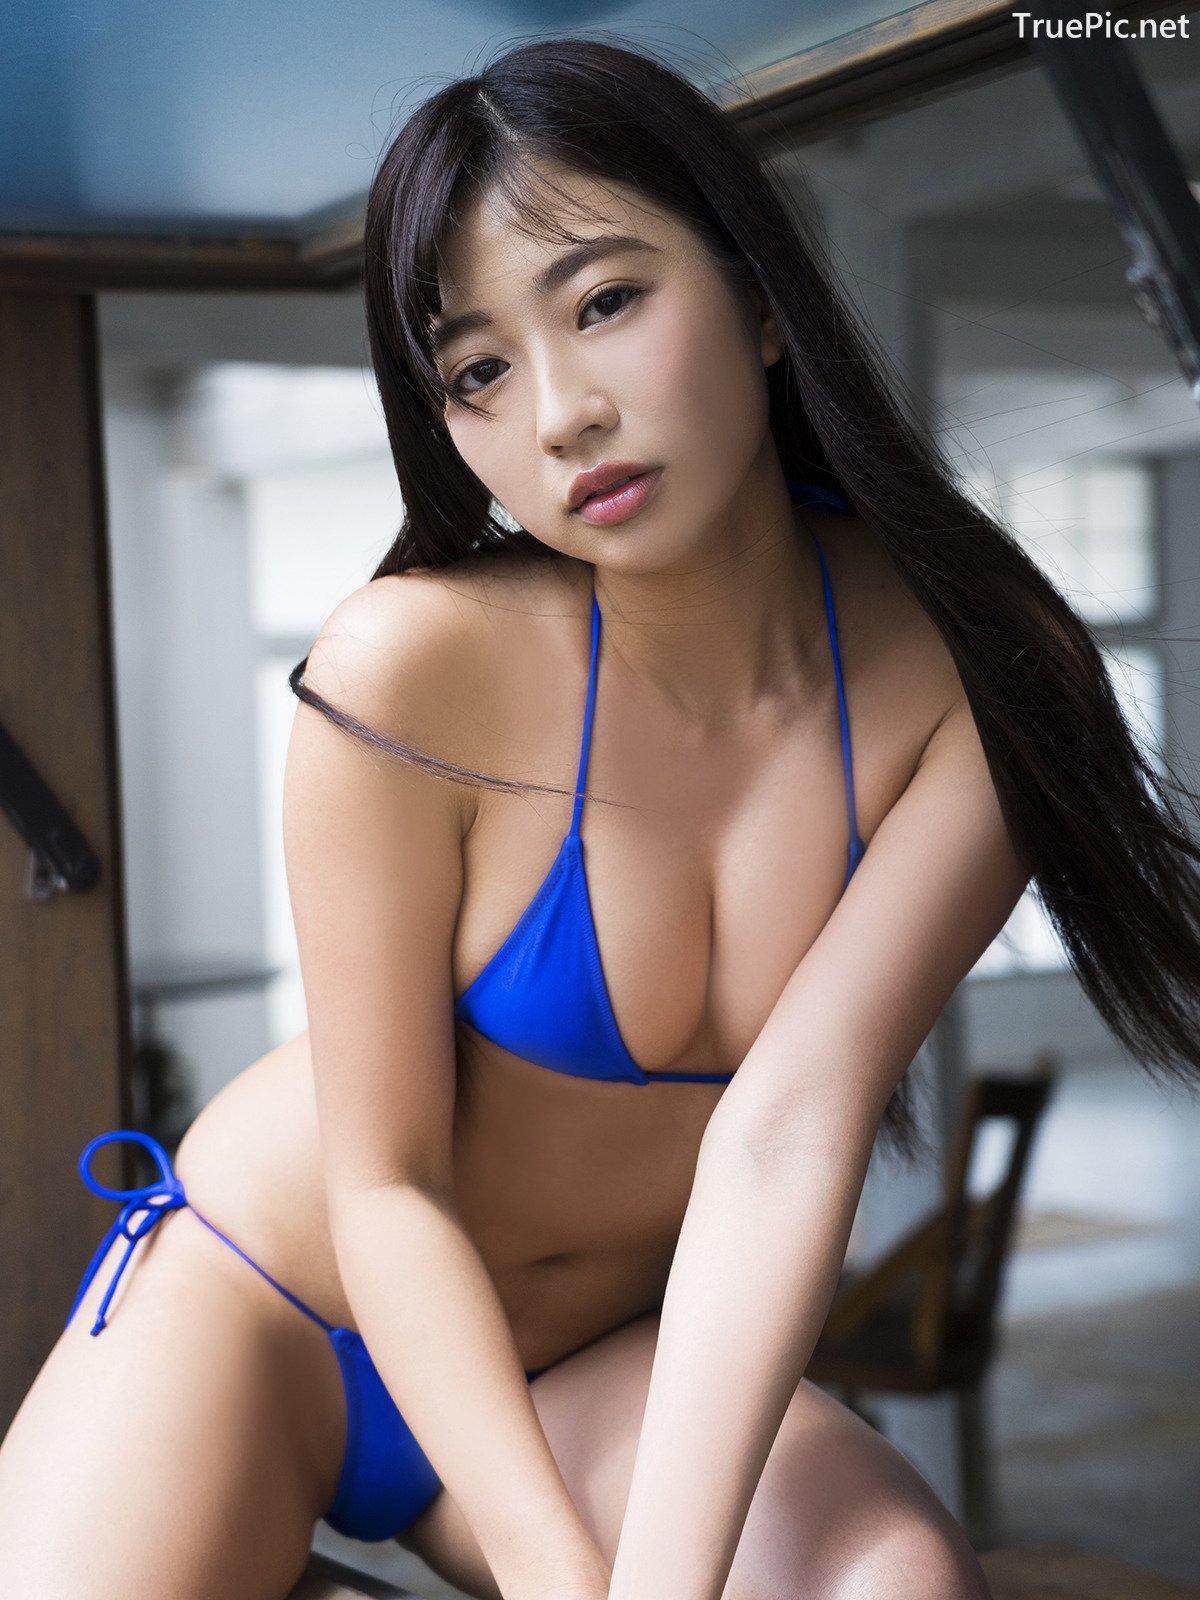 Image Japanese Gravure Model - Sayaka Ohnuki - Maiden Love Story - TruePic.net - Picture-35